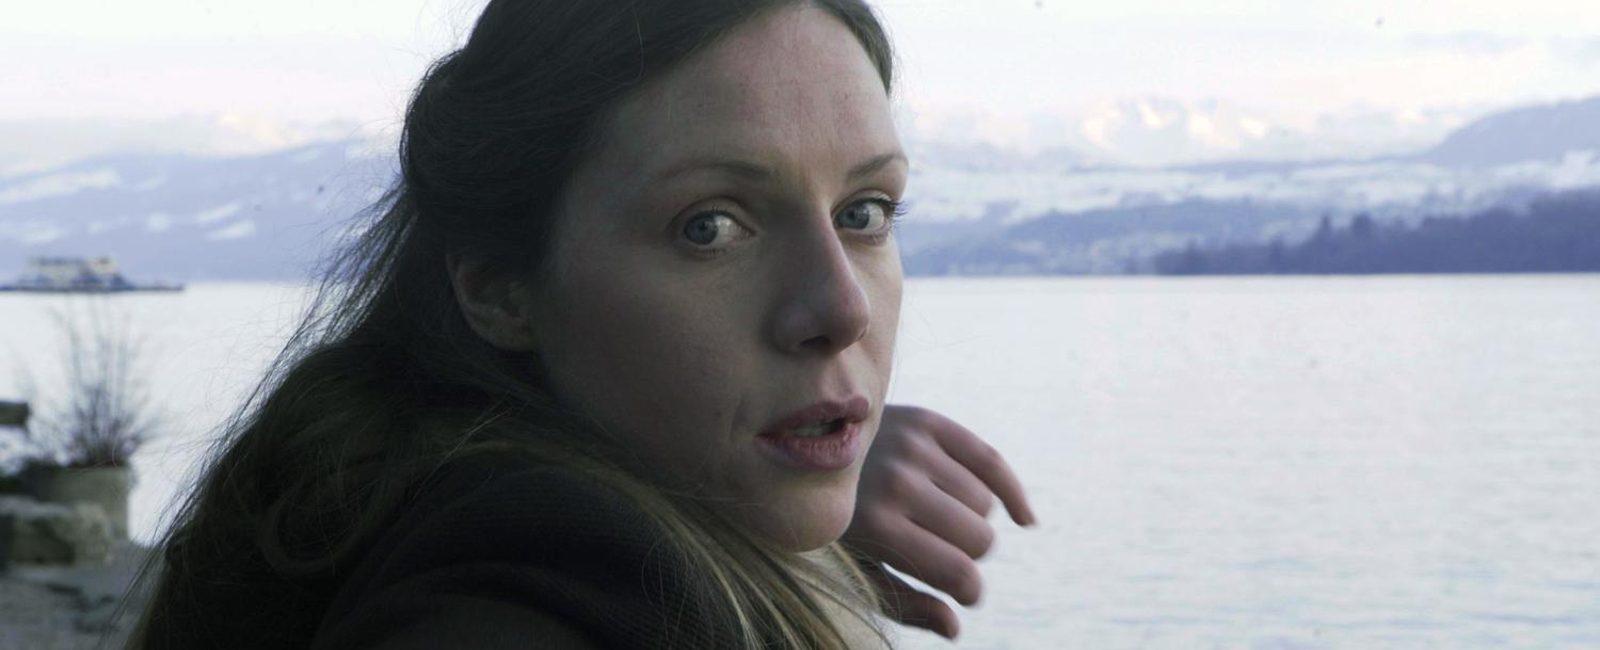 Sarah Ryan performing in Áine Stapleton's Horrible Creature at Lake Zurich.